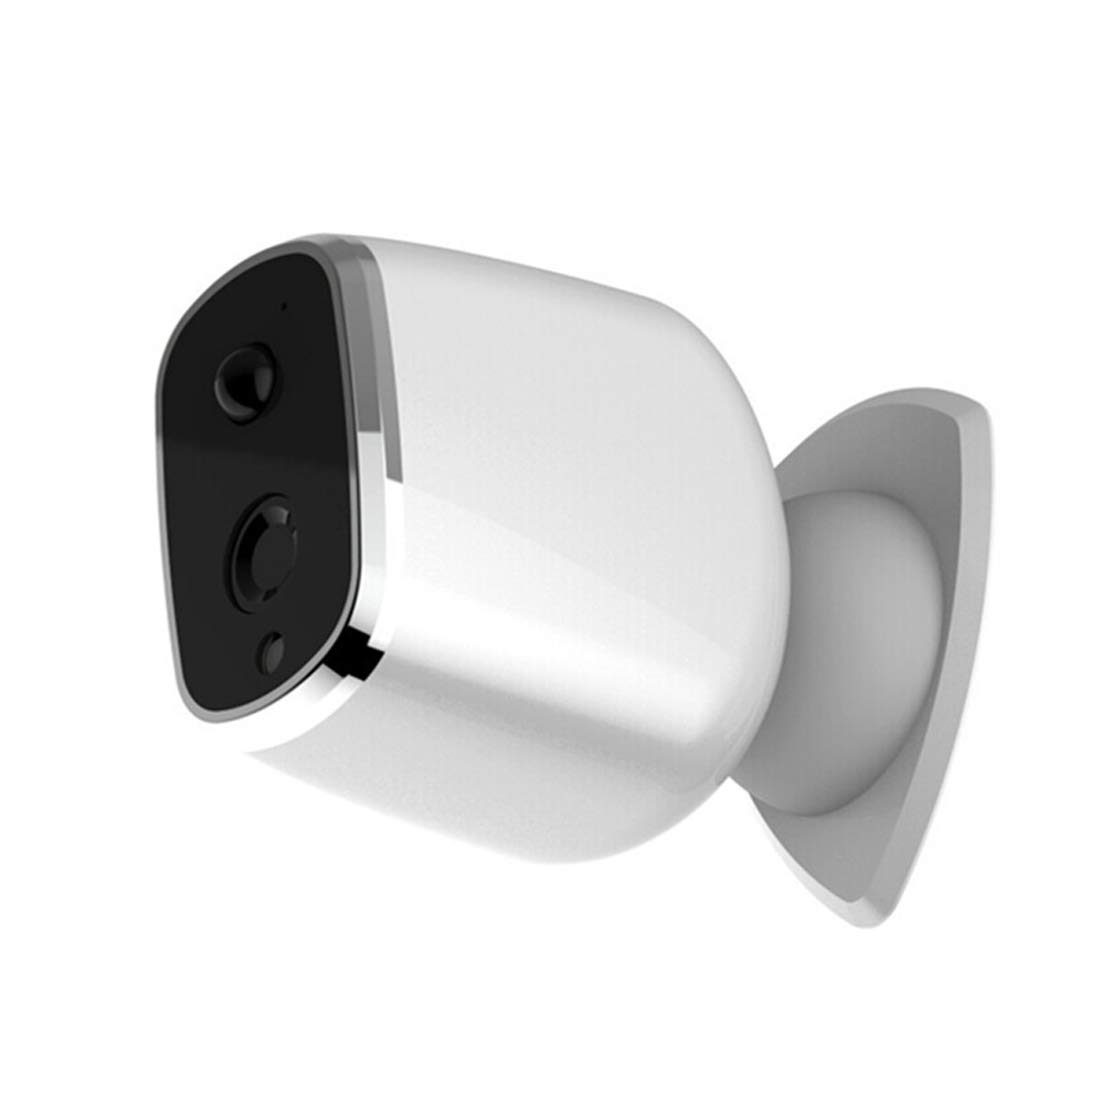 Foxsed-five ワイヤレスセキュリティカメラ960PスマートHD WiFi IPカメラ B07M9X1NDV、双方向通話 WiFi Foxsed-five、PIR赤外線検出 B07M9X1NDV, ロッカショムラ:641f54e2 --- ero-shop-kupidon.ru